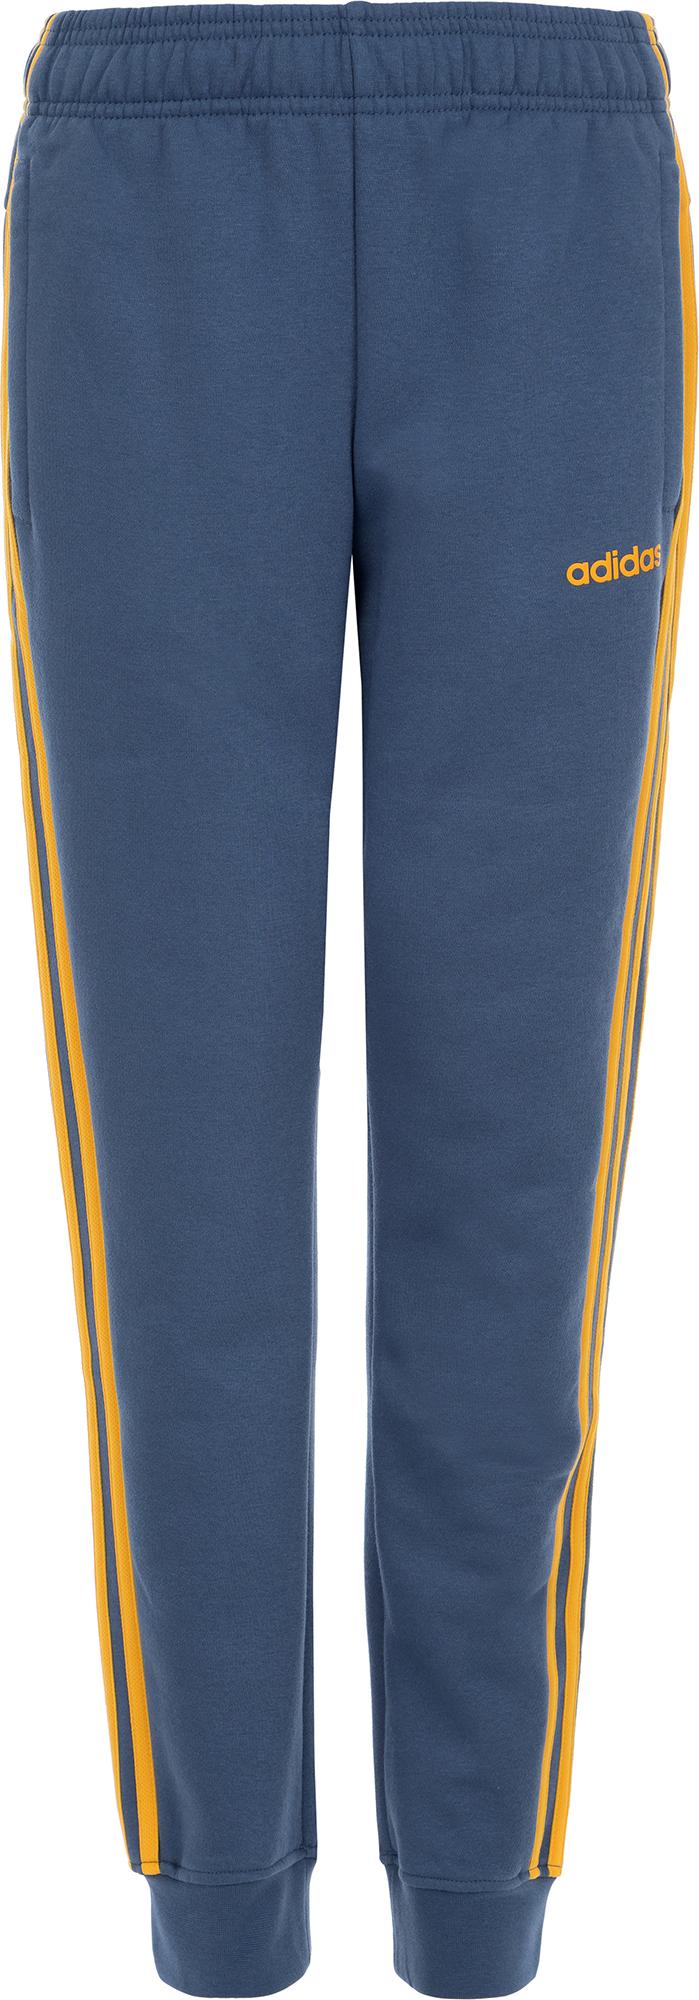 Adidas Брюки для мальчиков Essentials 3-Stripes, размер 164